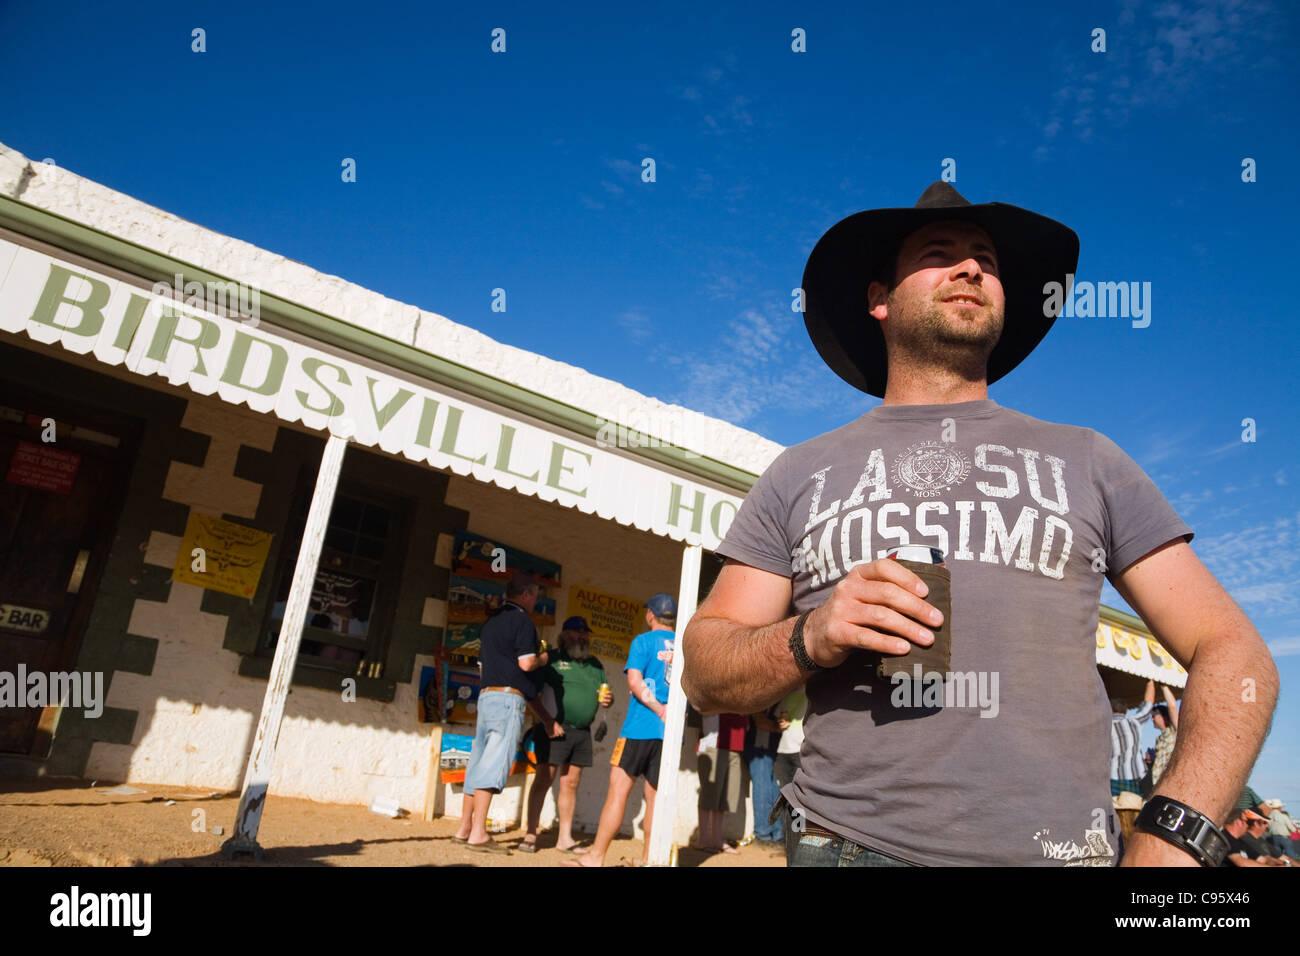 Enjoying a beer at the iconic Birdsville Hotel, during the annual Birdsville races. Birdsville, Queensland, Australia - Stock Image